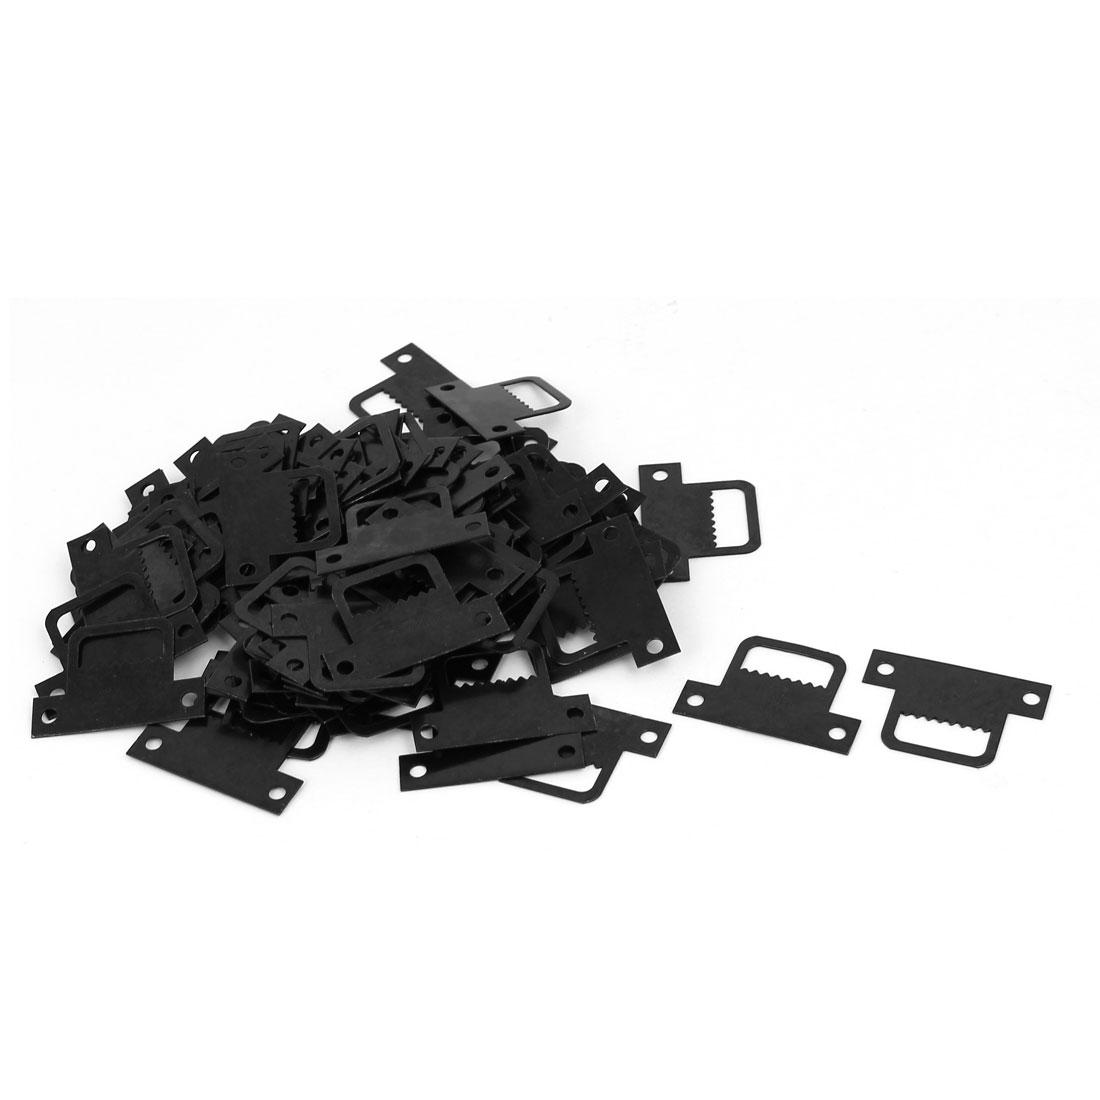 Cross Stitch Picture Frame T Shape Sawtooth Hanger Black 32mmx8mmx22mm 100pcs